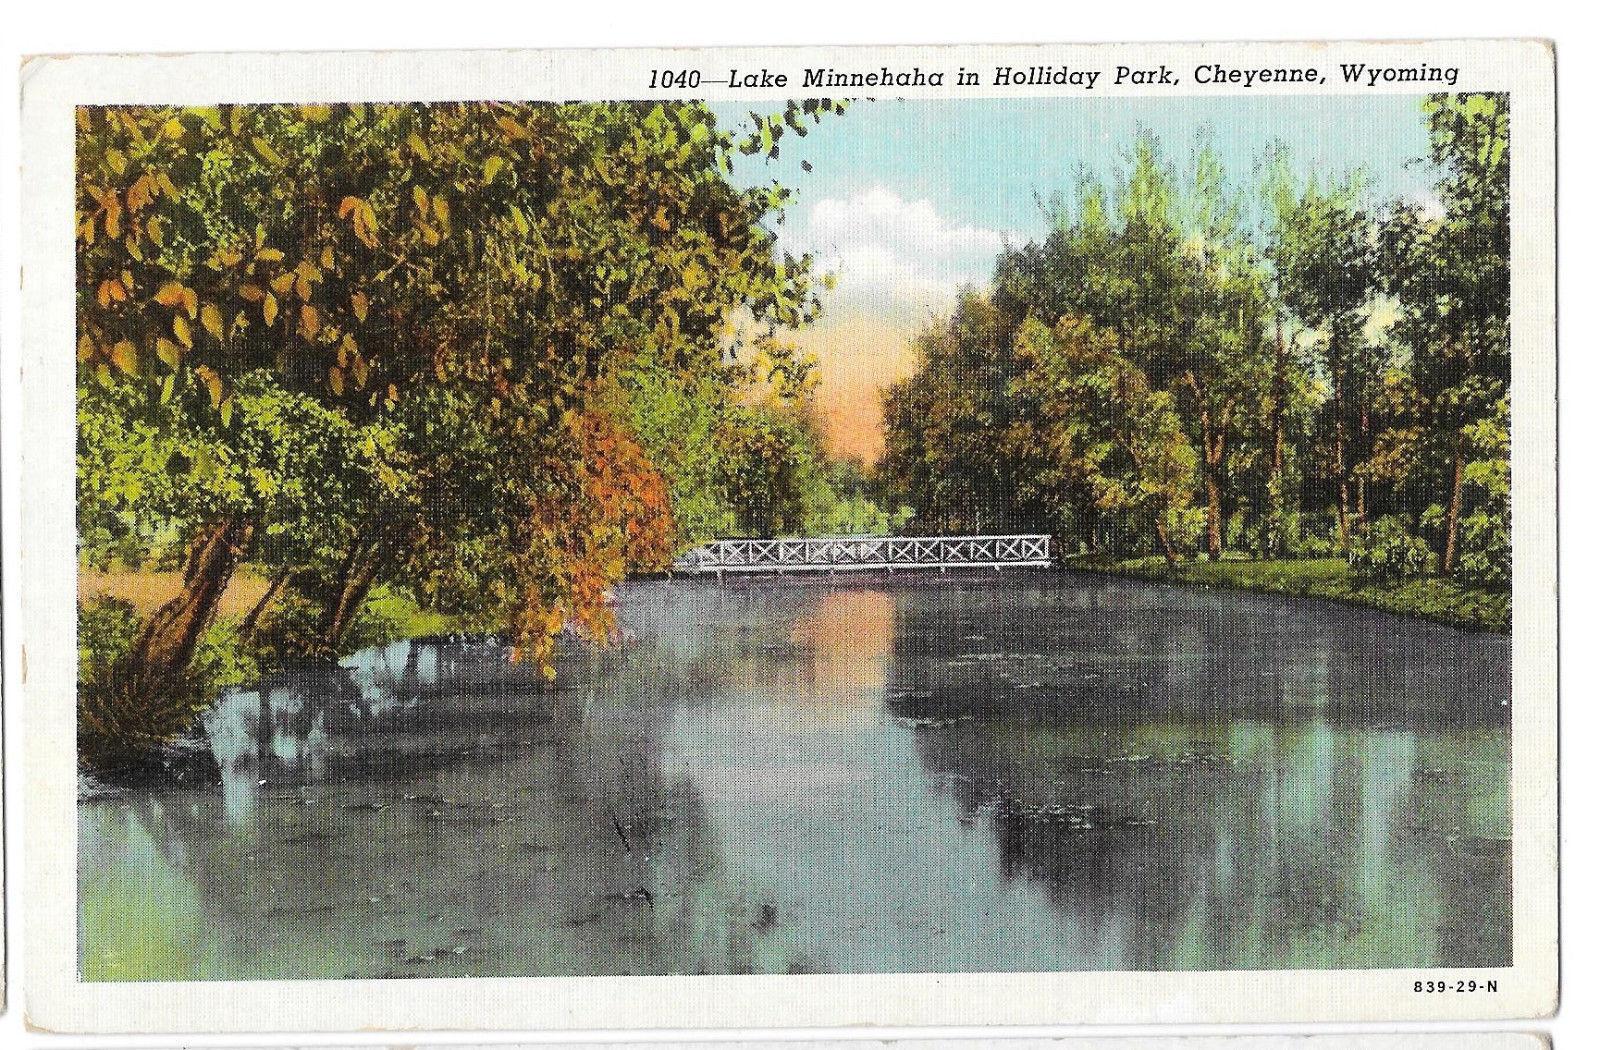 wy cheyenne lake minnehaha holliday park vtg sanborn